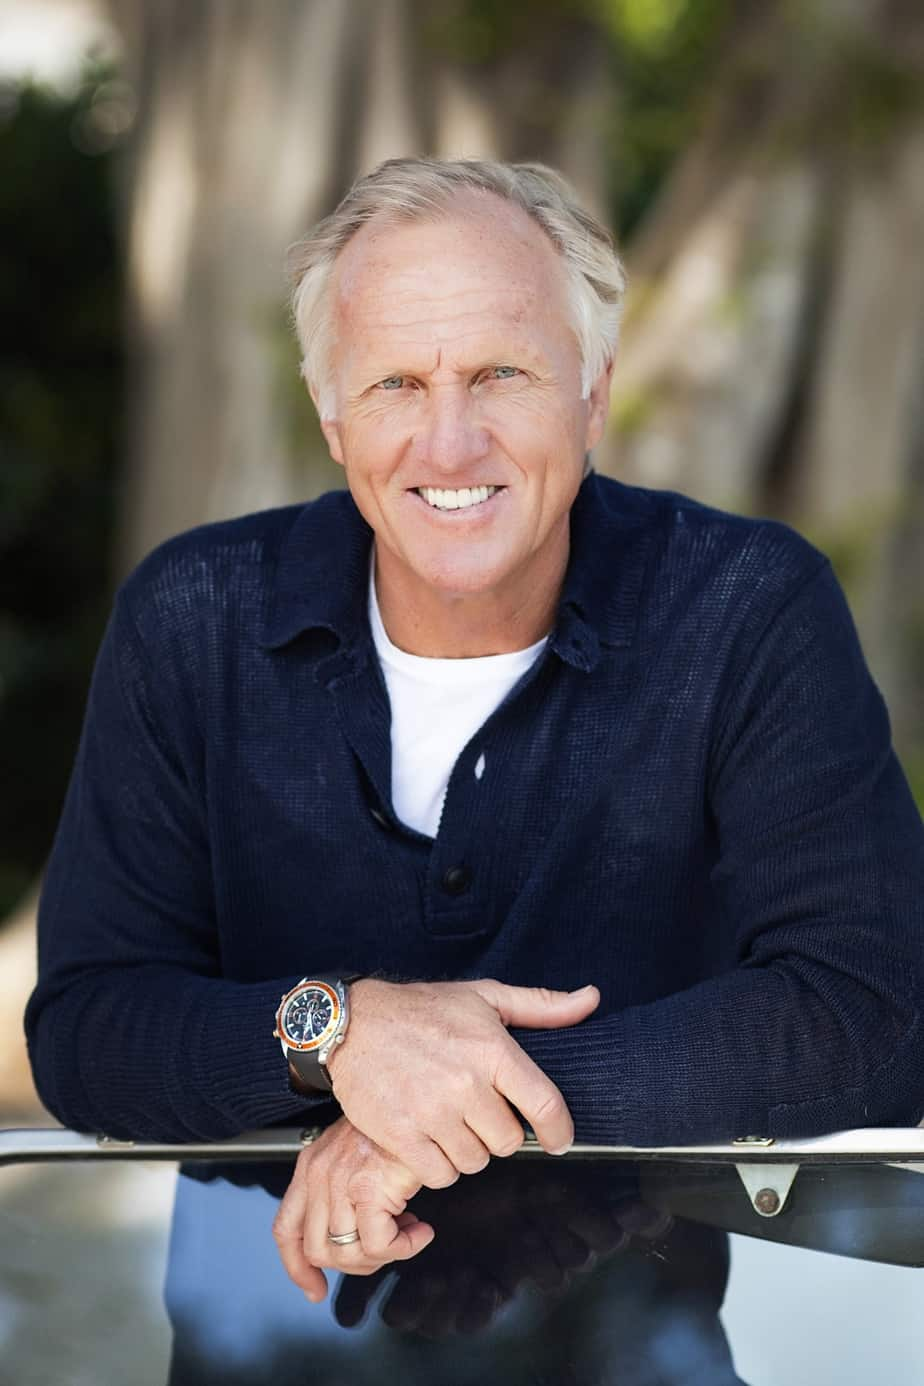 Greg_Norman_richest-golfer-in-the-world